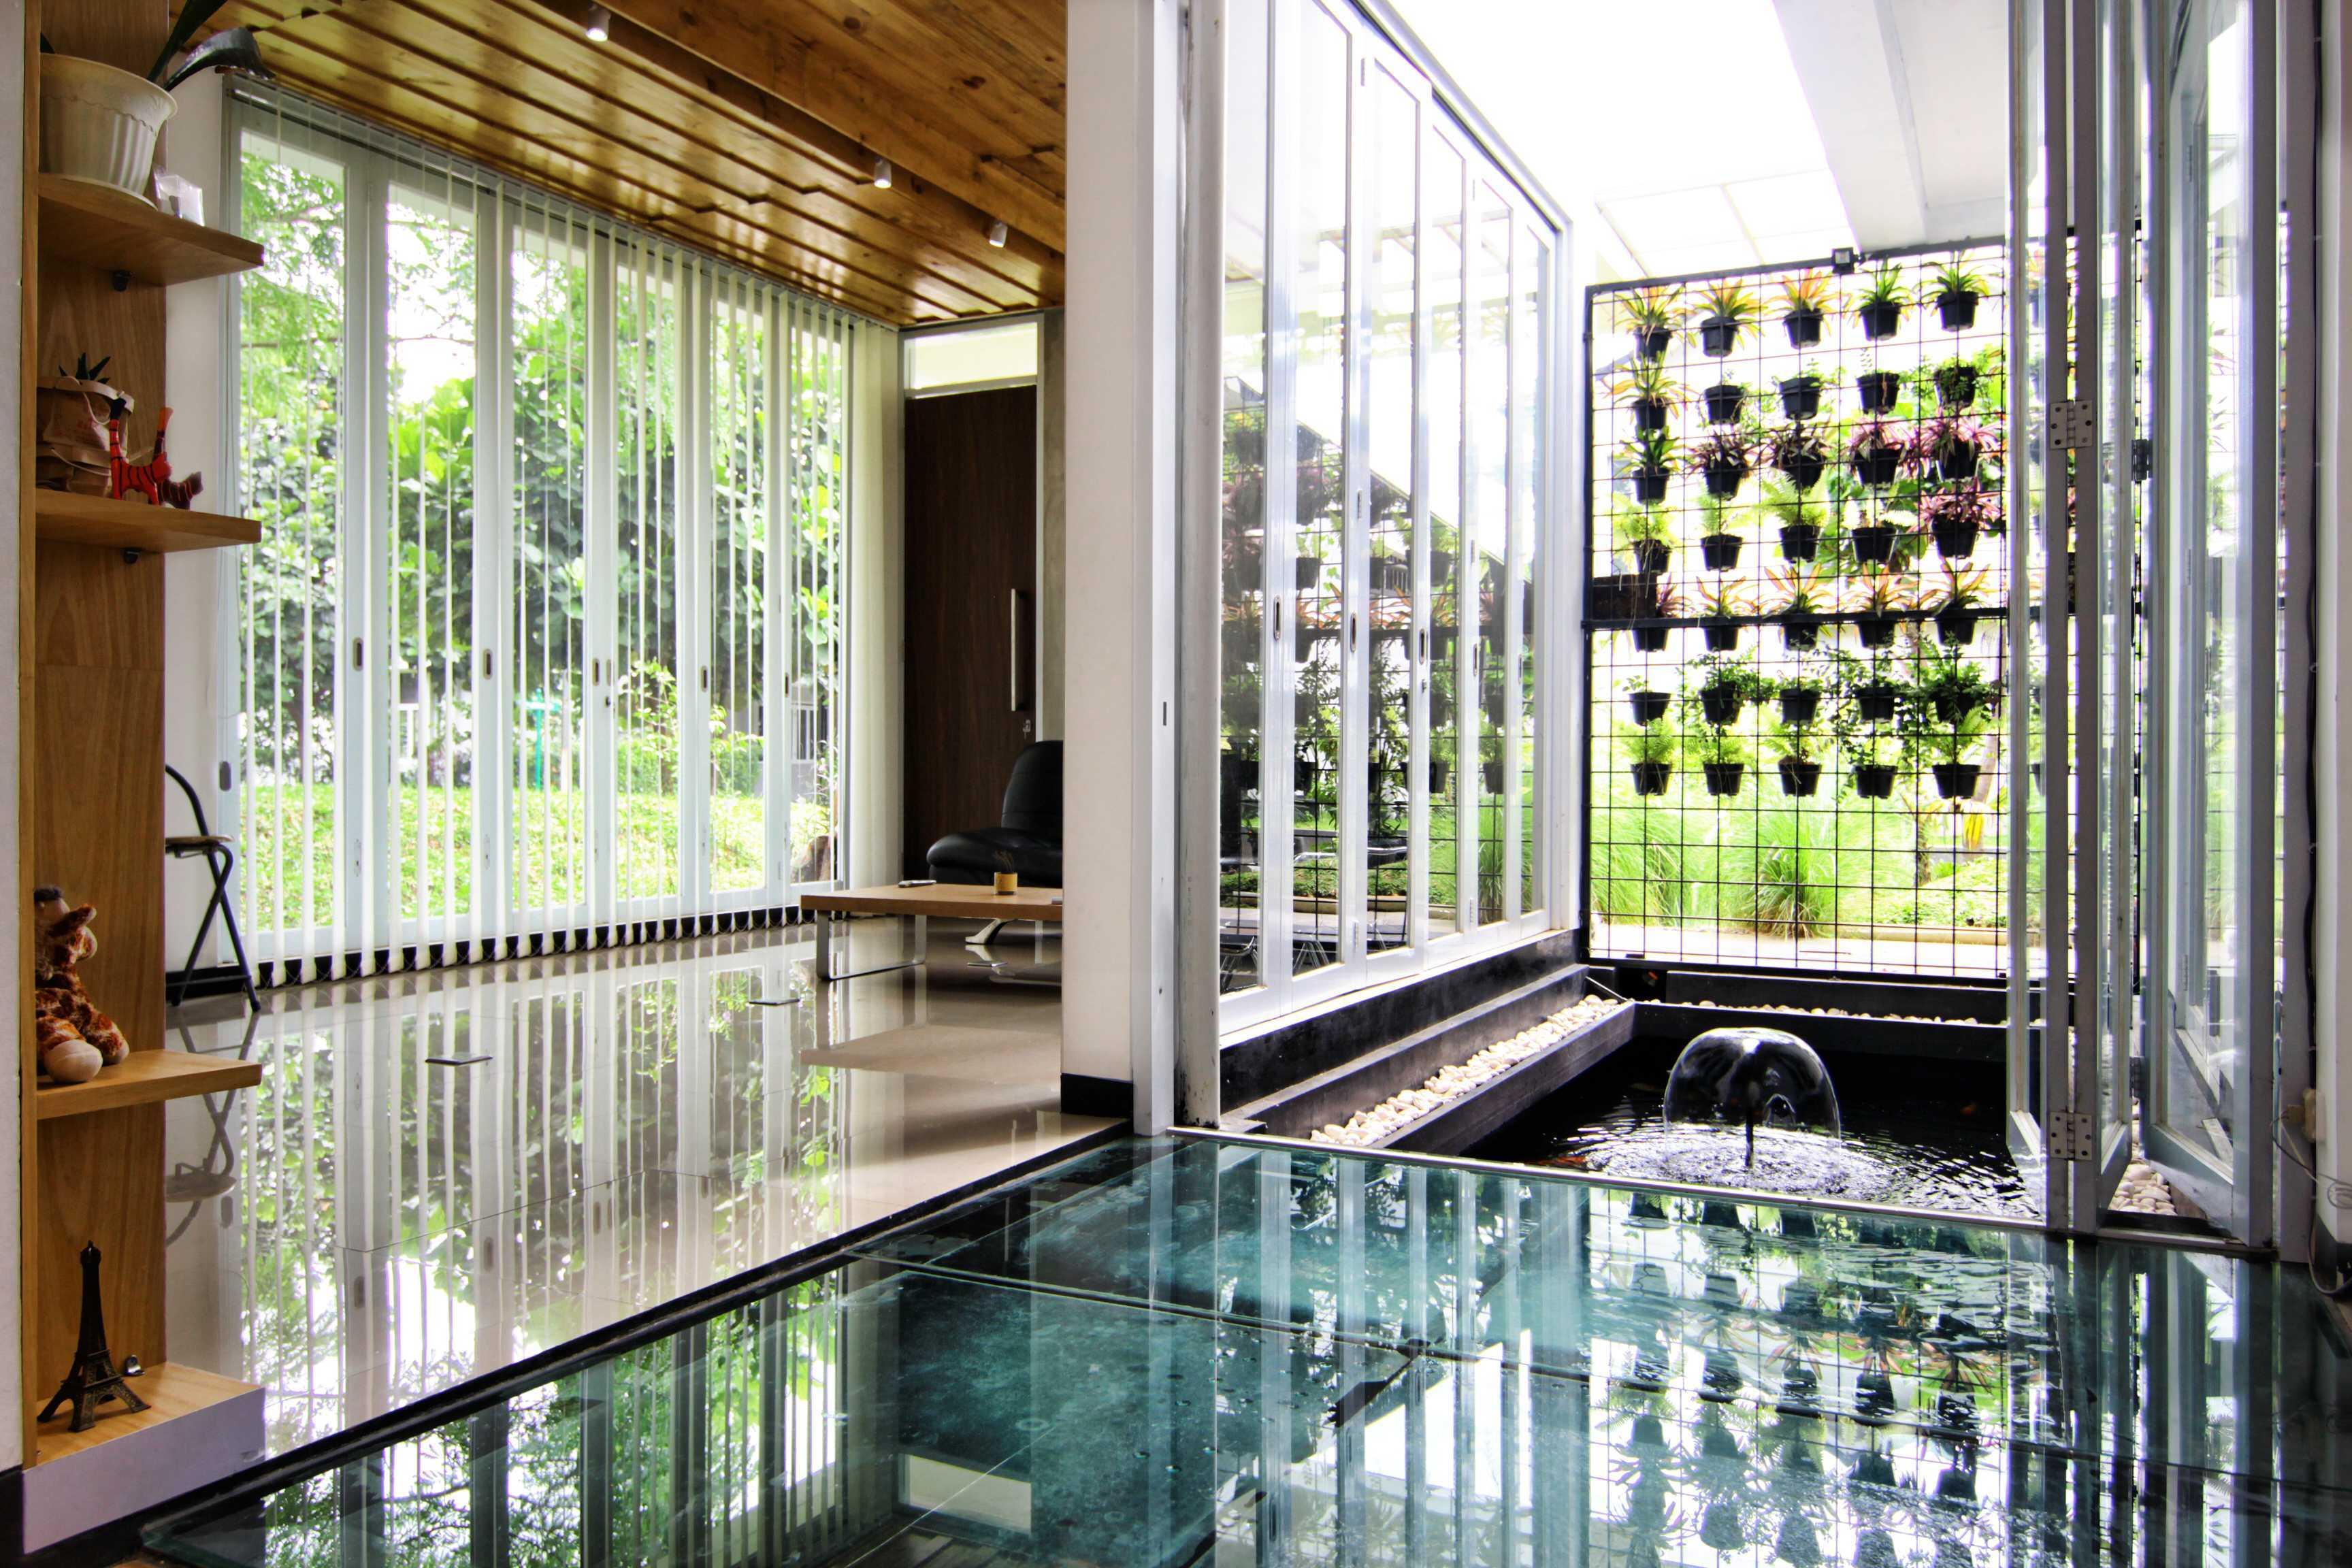 Mineli Architects Al House Baros, Cimahi Tengah, Kota Cimahi, Jawa Barat, Indonesia Baros, Cimahi Tengah, Kota Cimahi, Jawa Barat, Indonesia Pond   45271